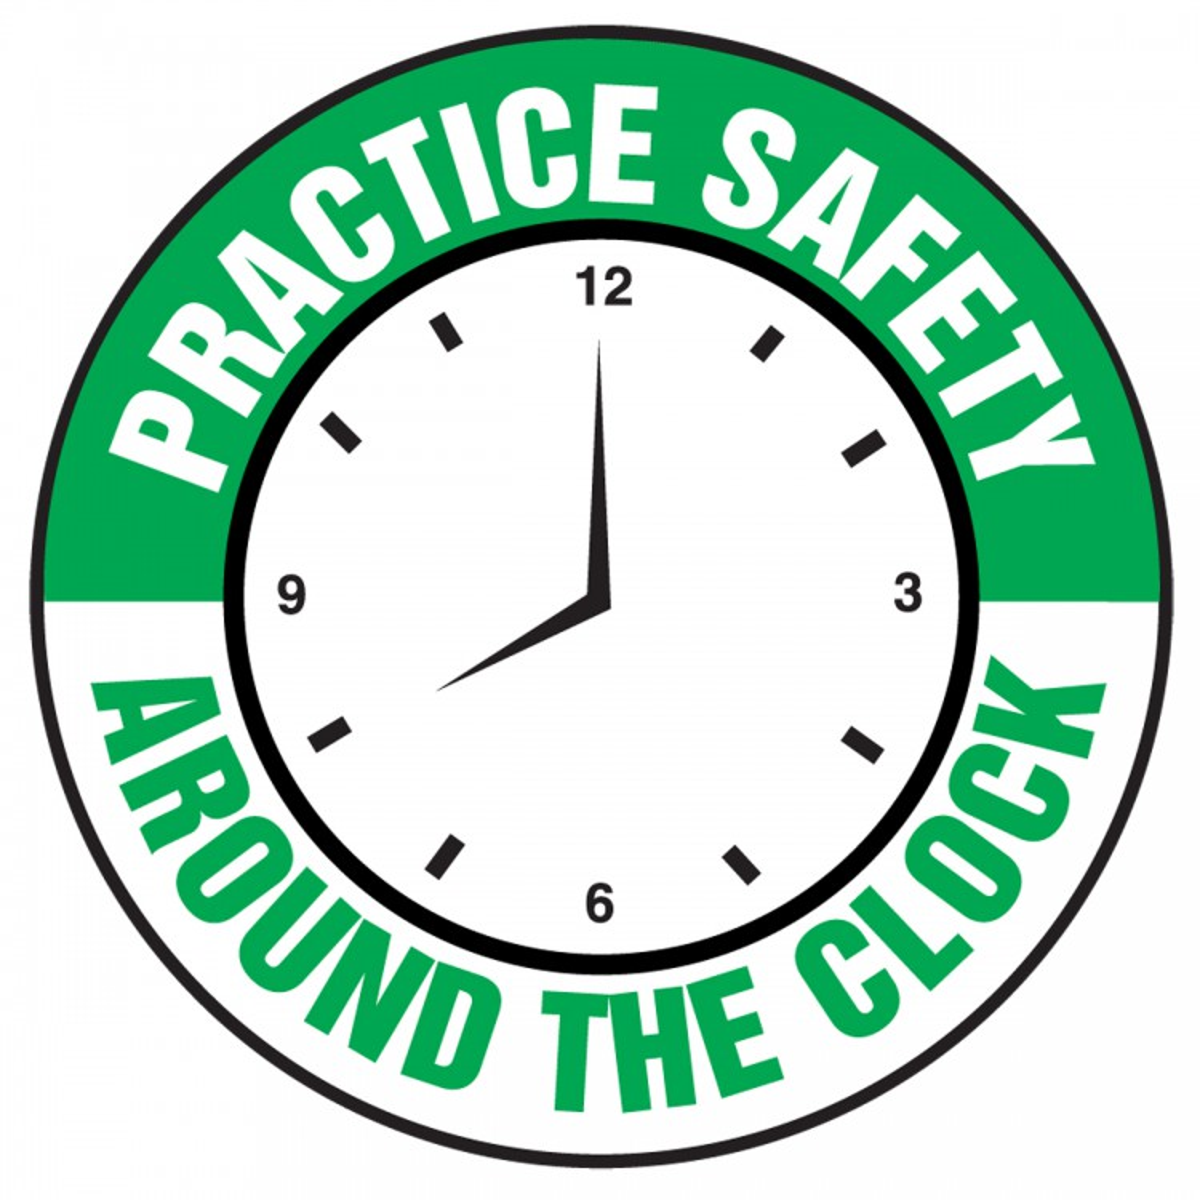 PRACTICE SAFETY AROUND THE CLOCK